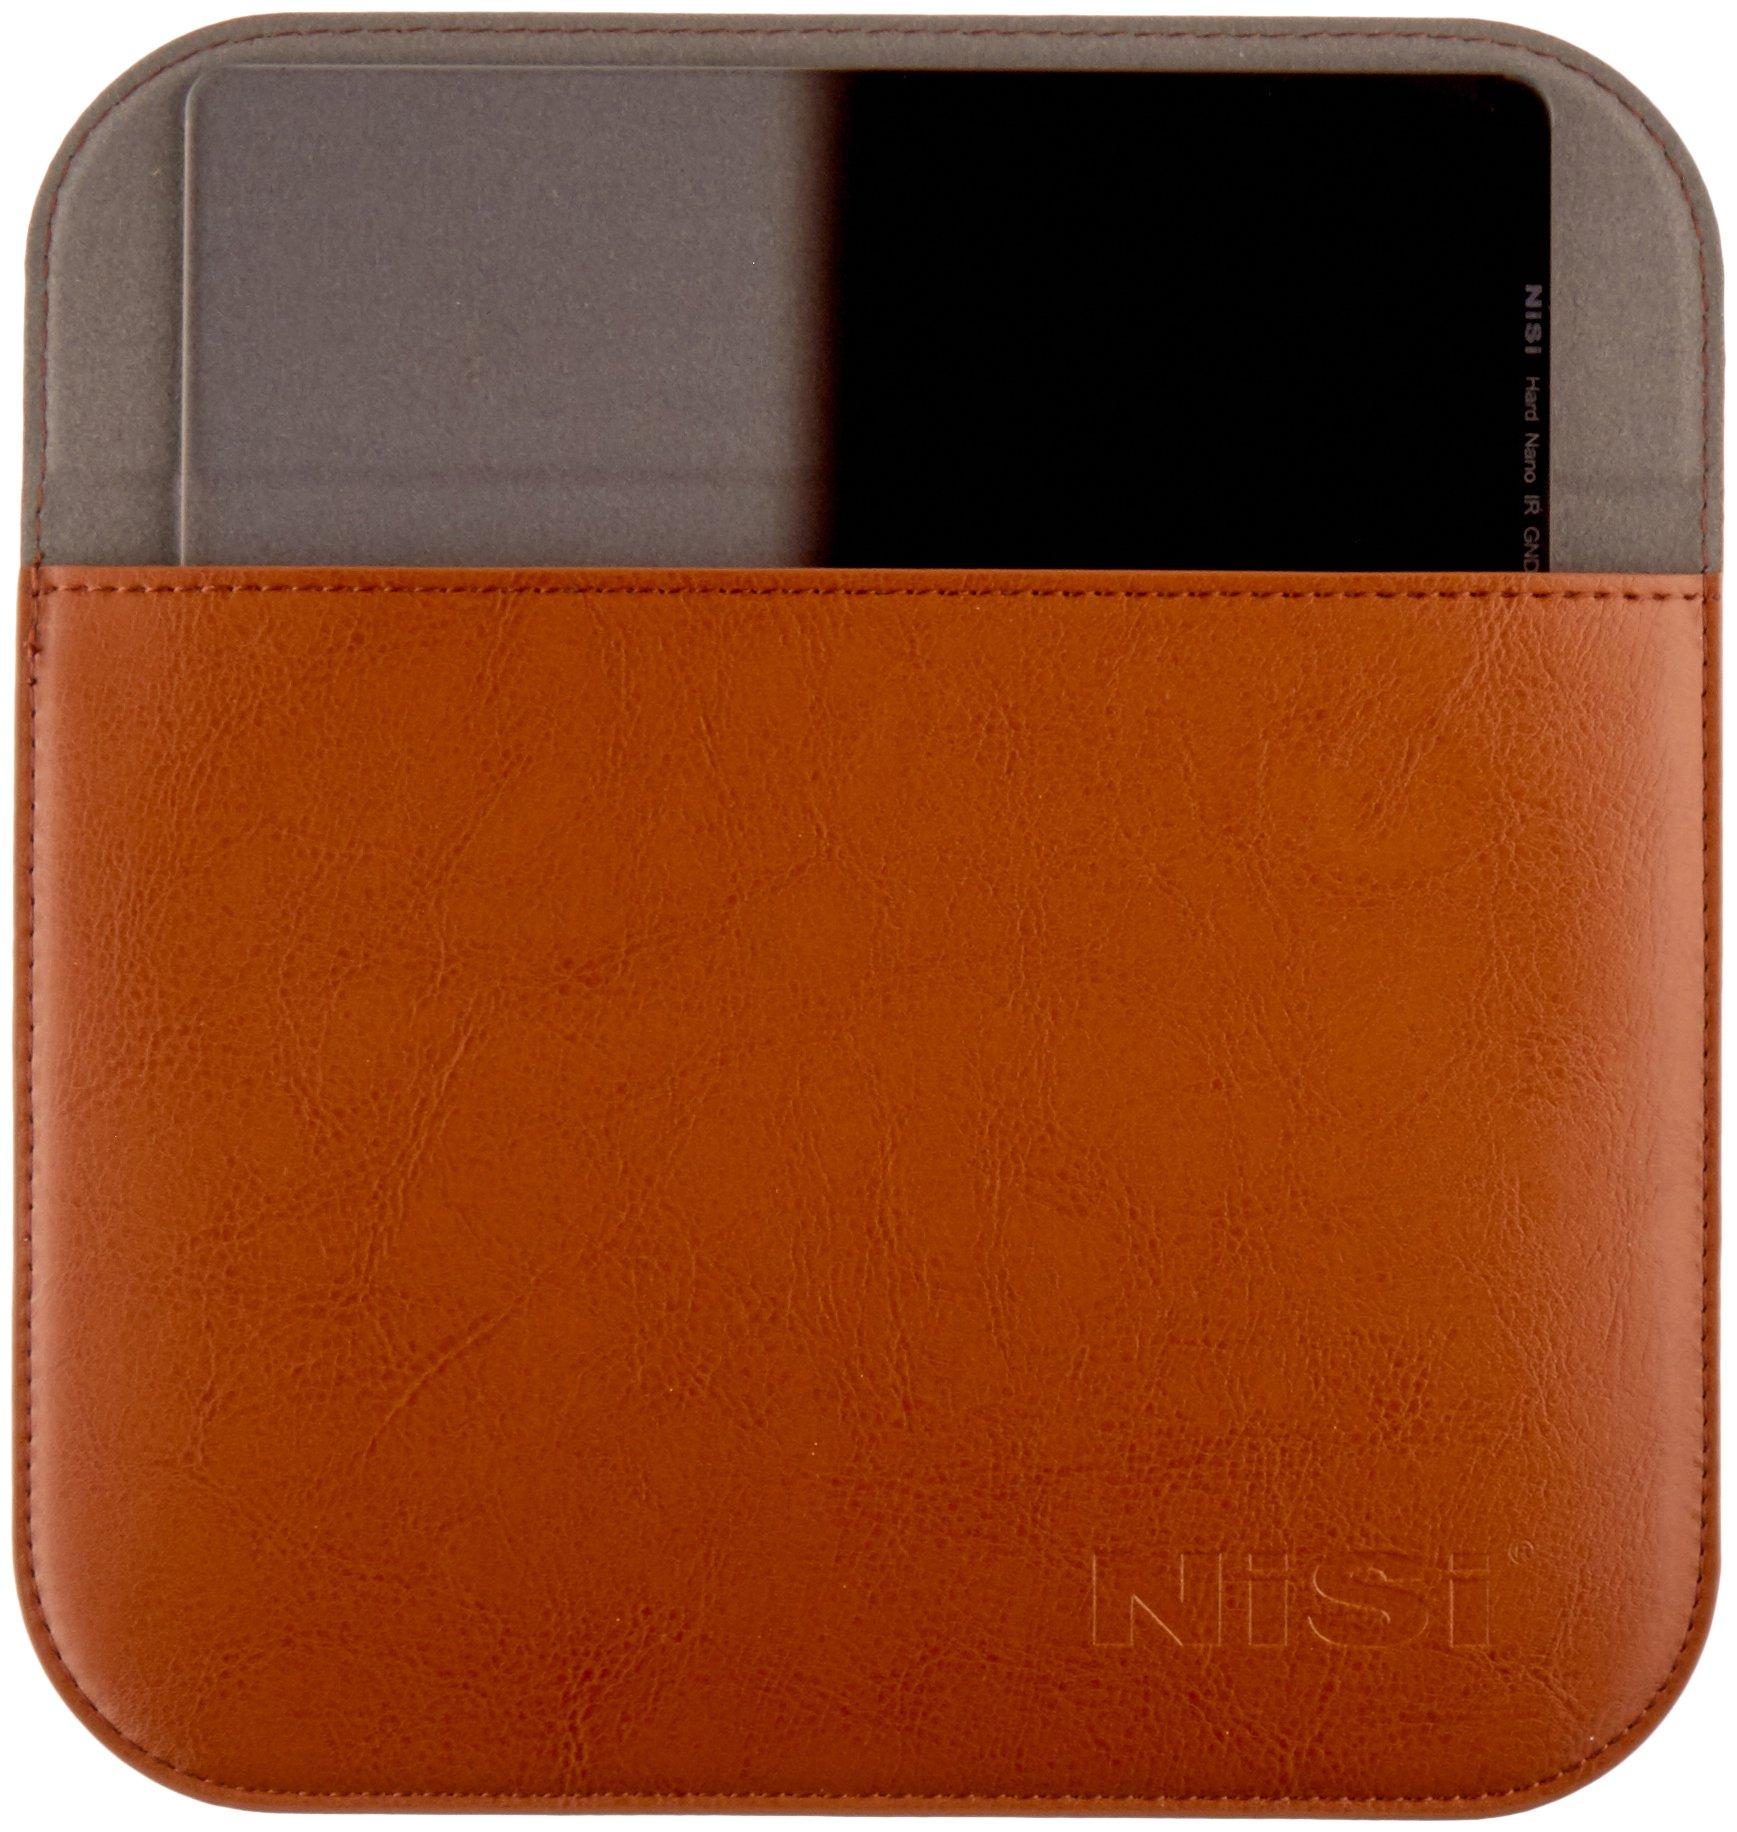 Ikan Hard Graduated Neutral Density IR Lens Filter (NiSi), Black (Hard IR GND(8) 0.9 100x150) by NiSi